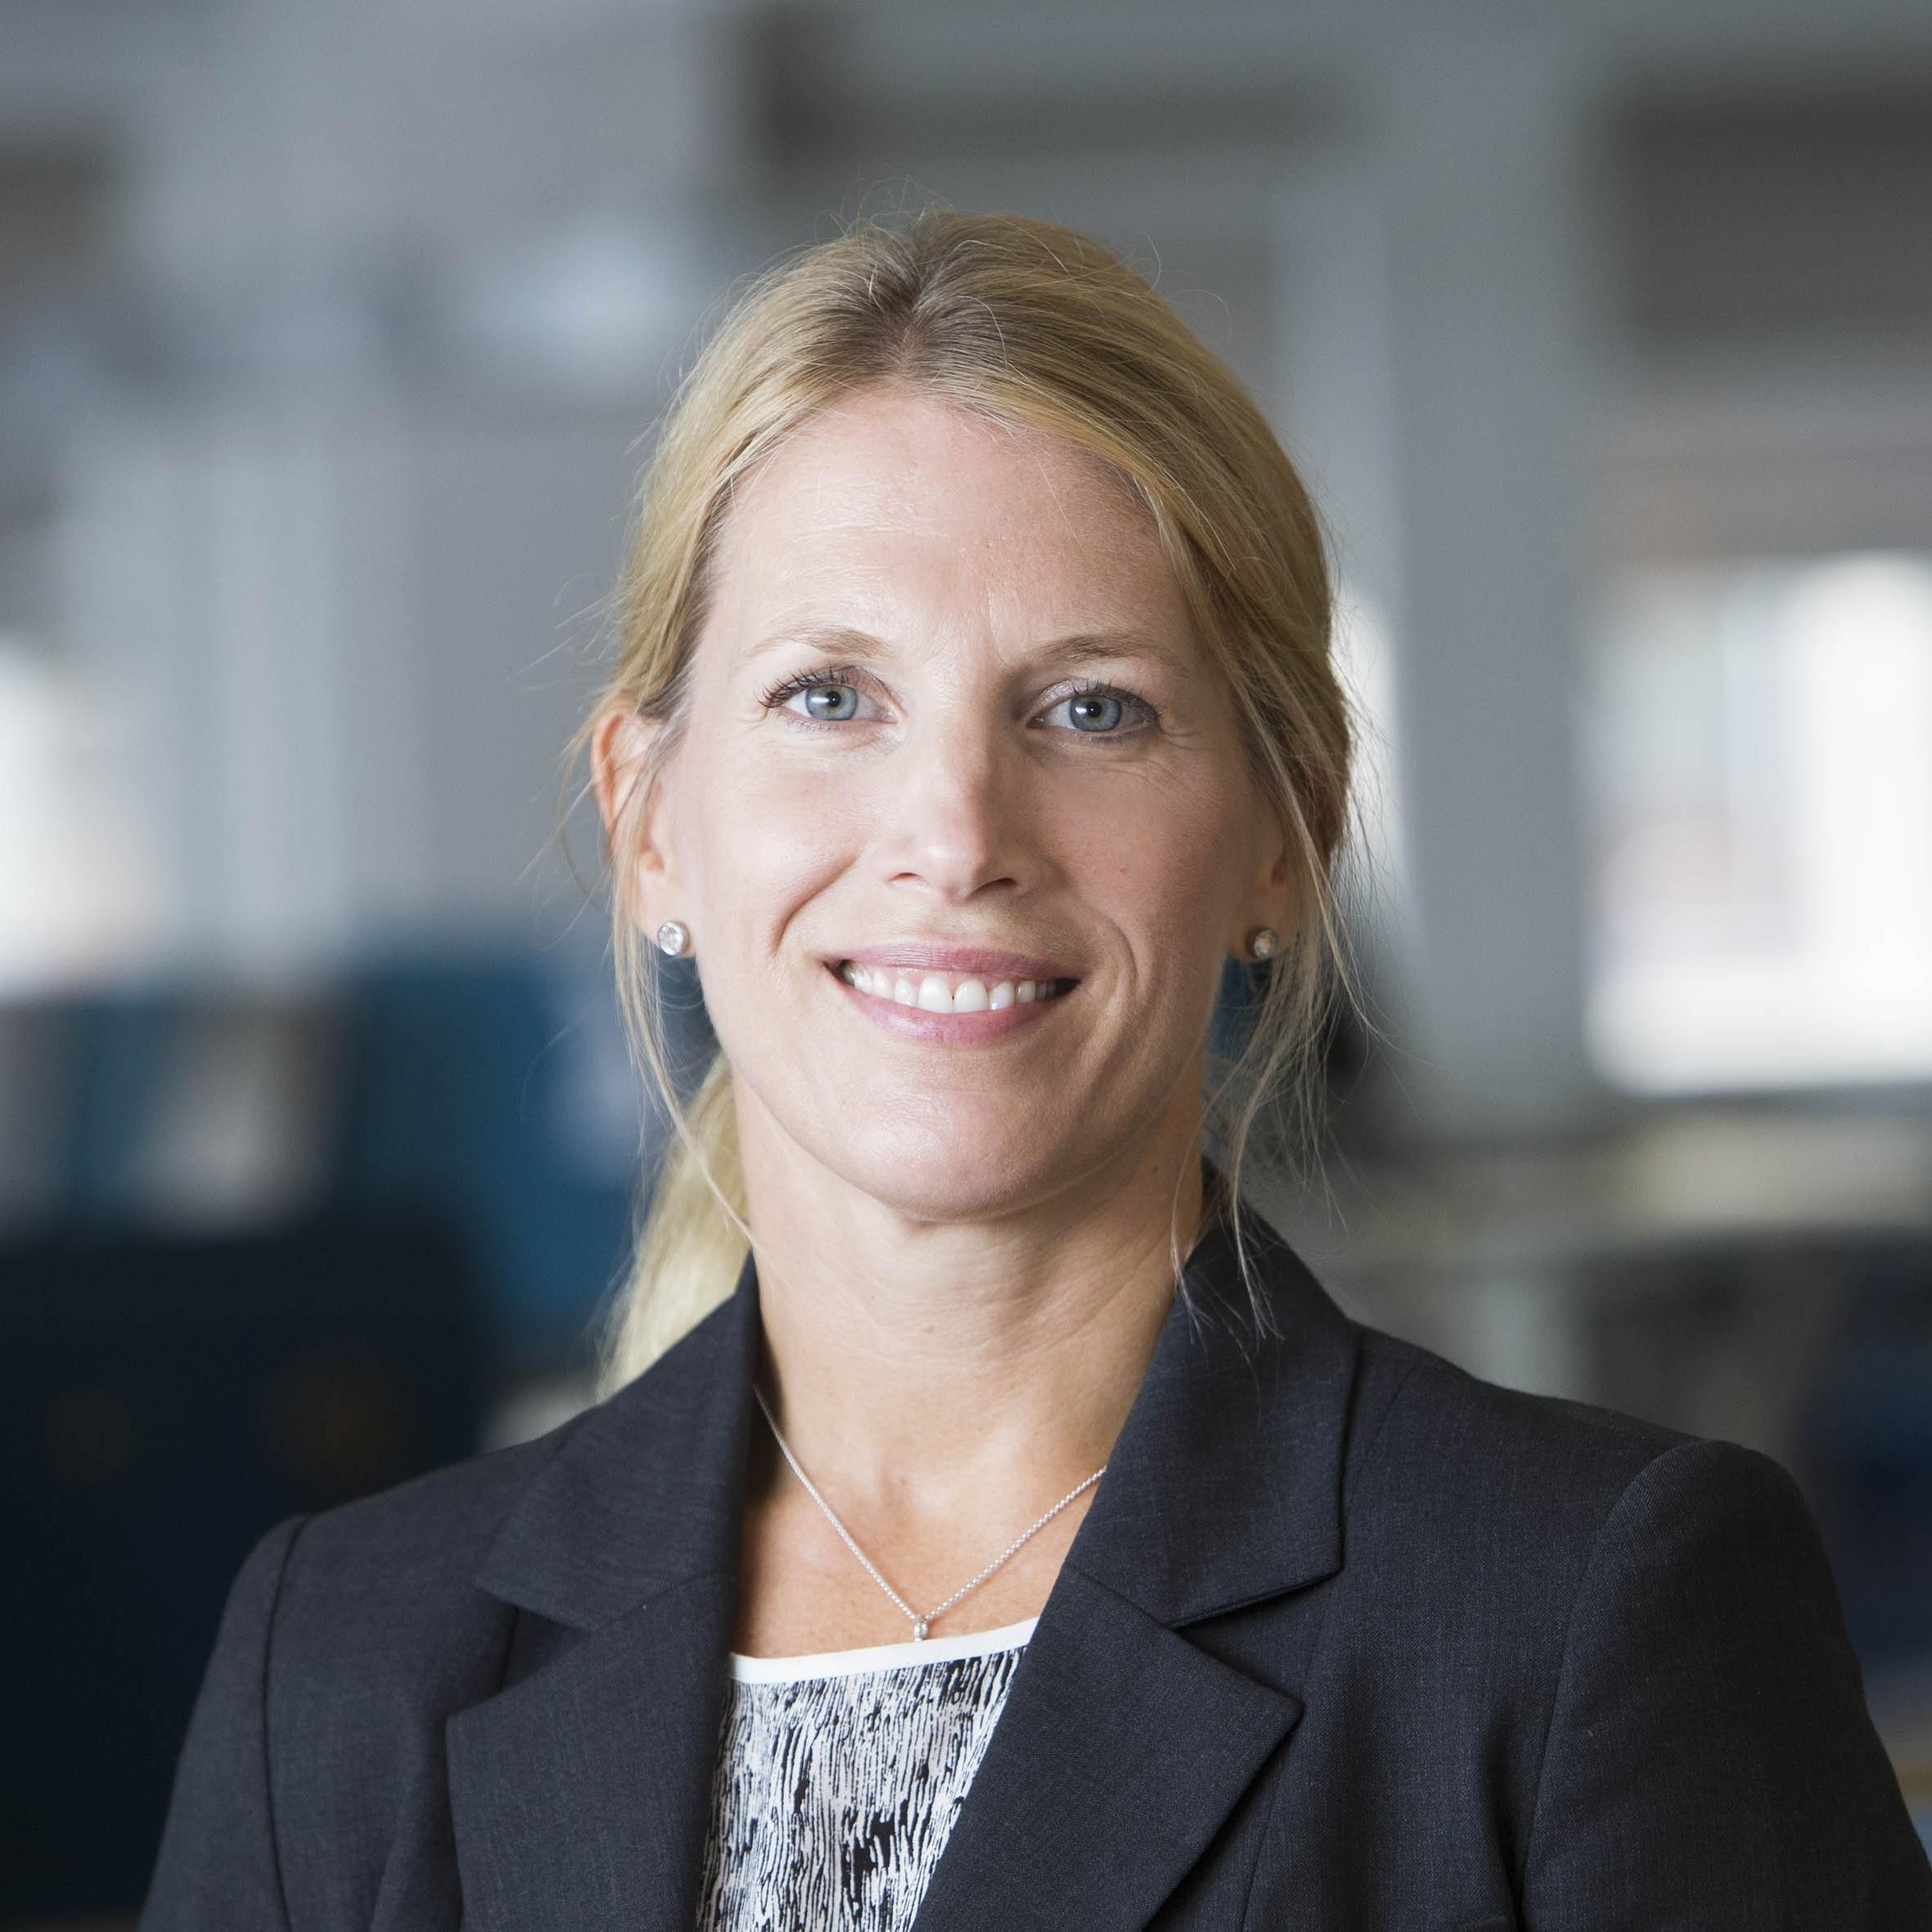 Miranda Jensen